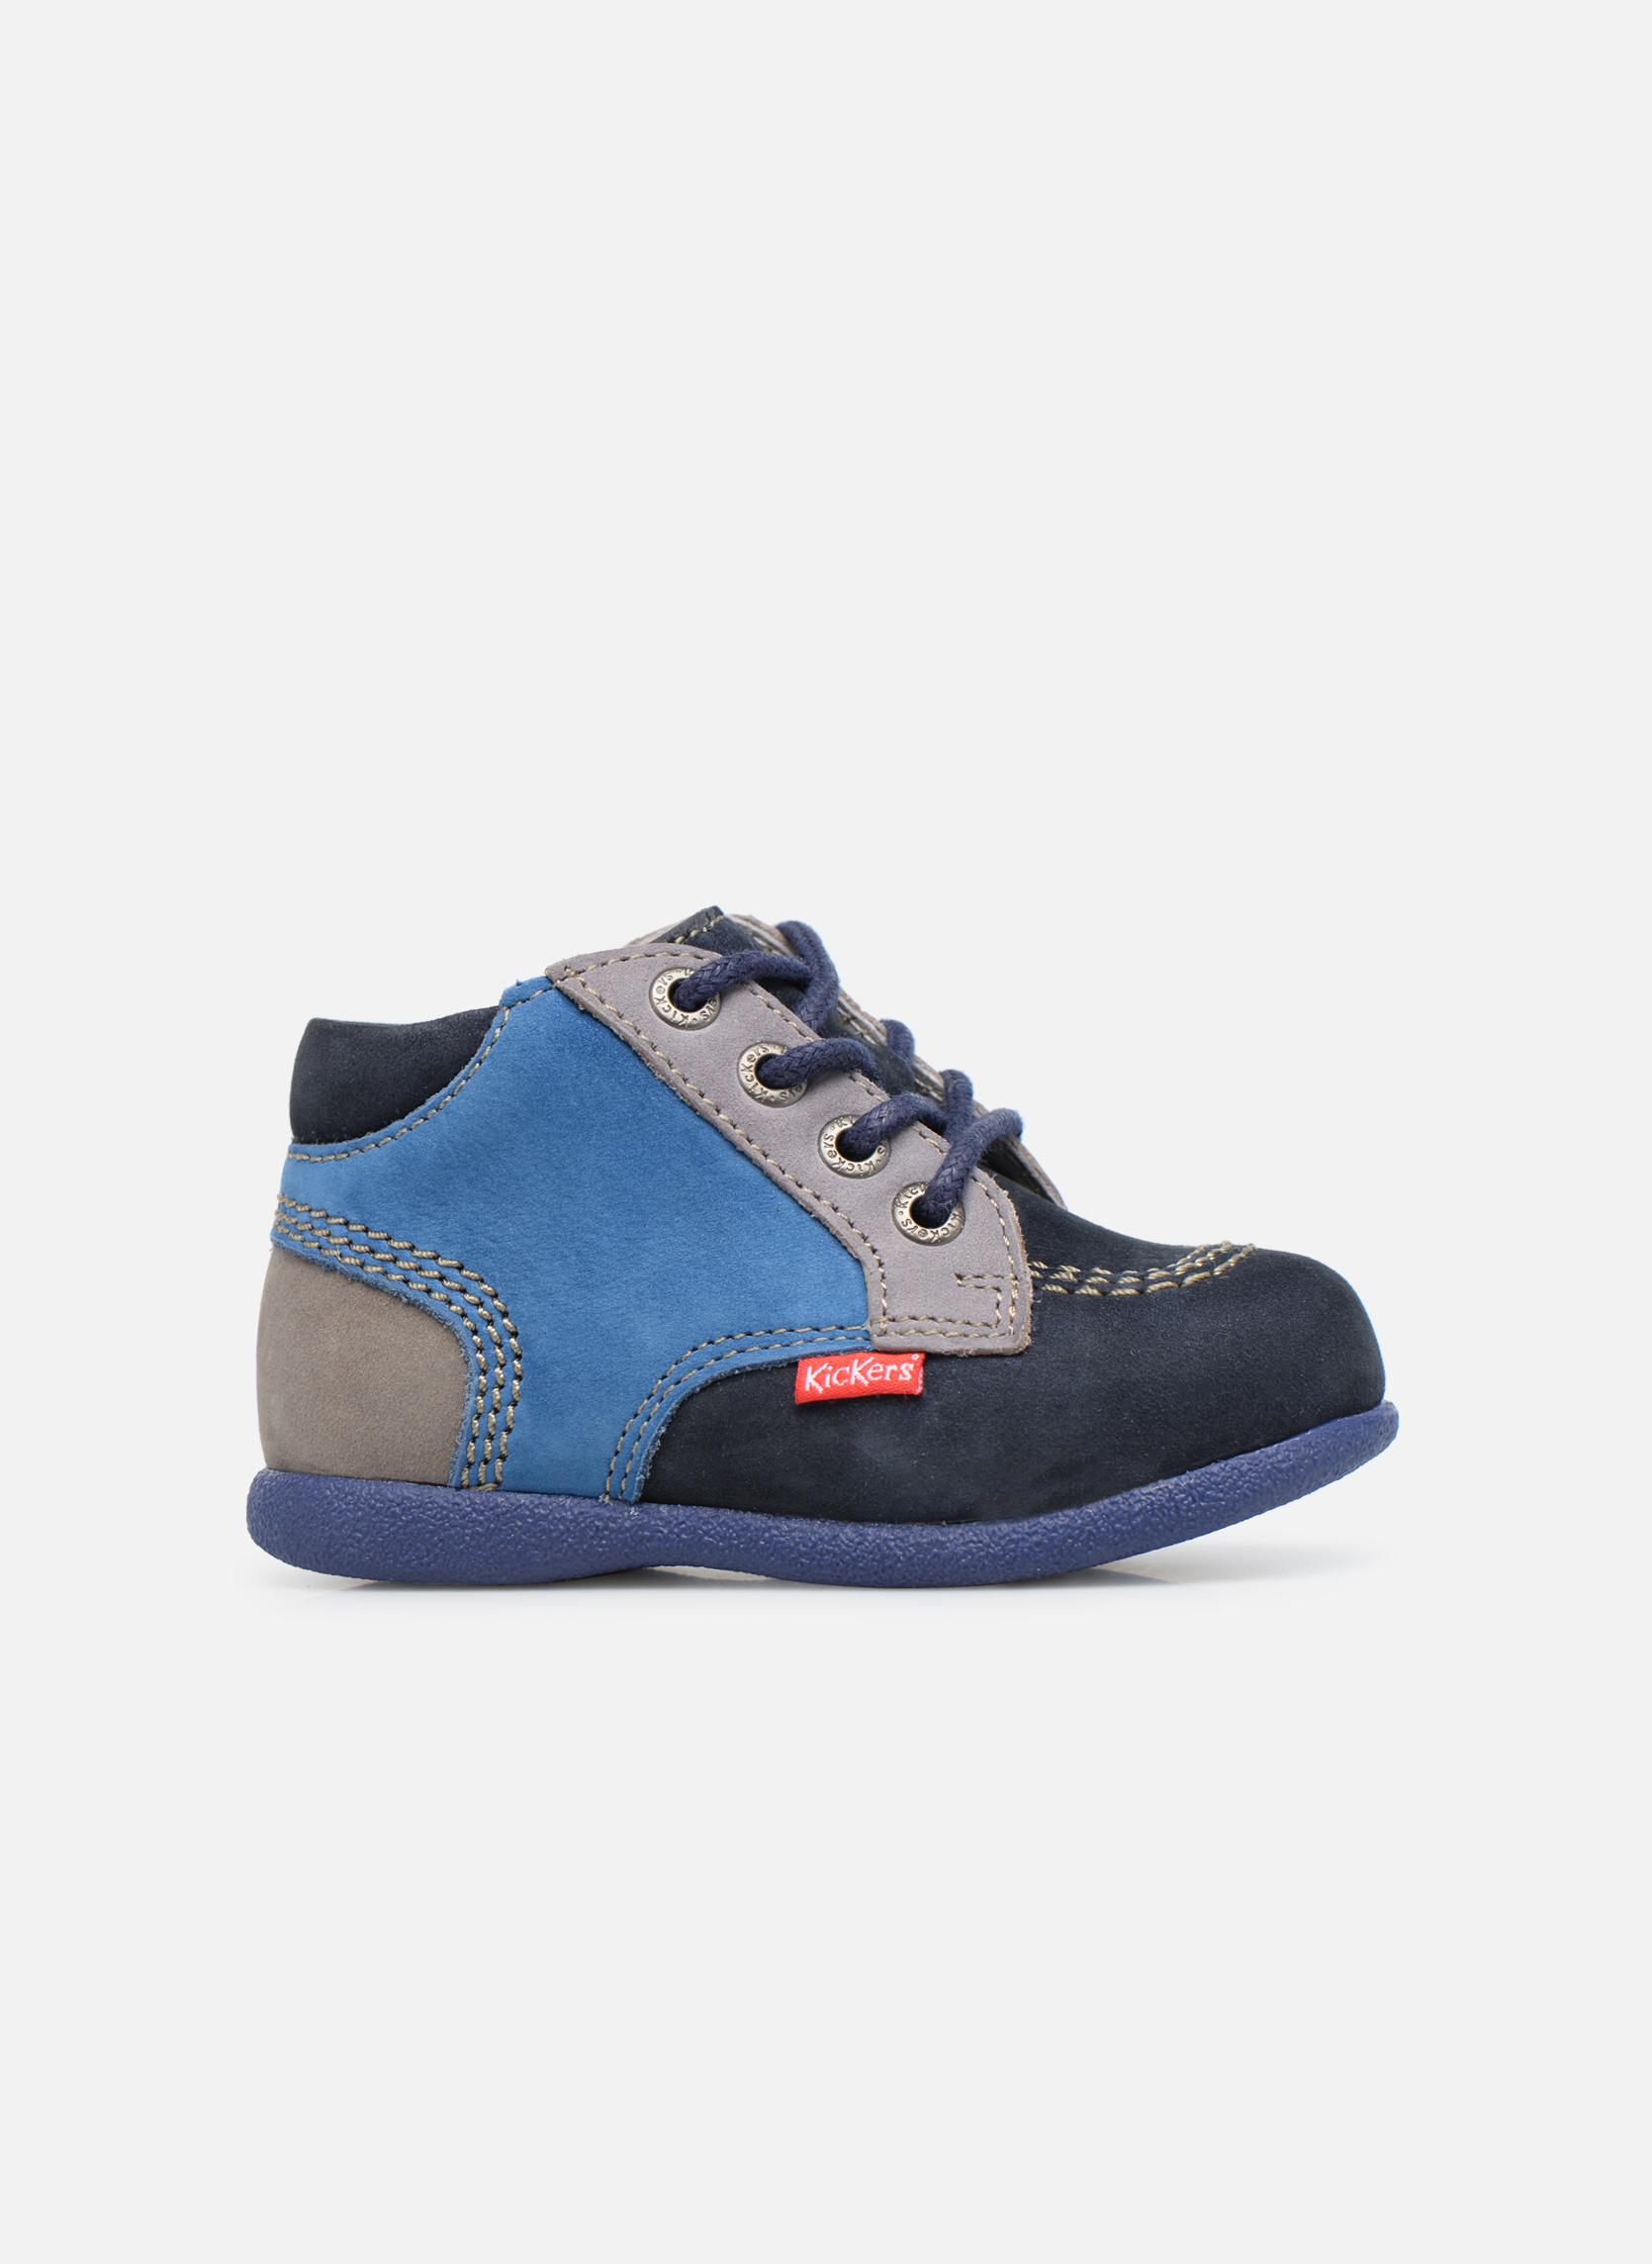 Bottines et boots Kickers Babystan Bleu vue derrière